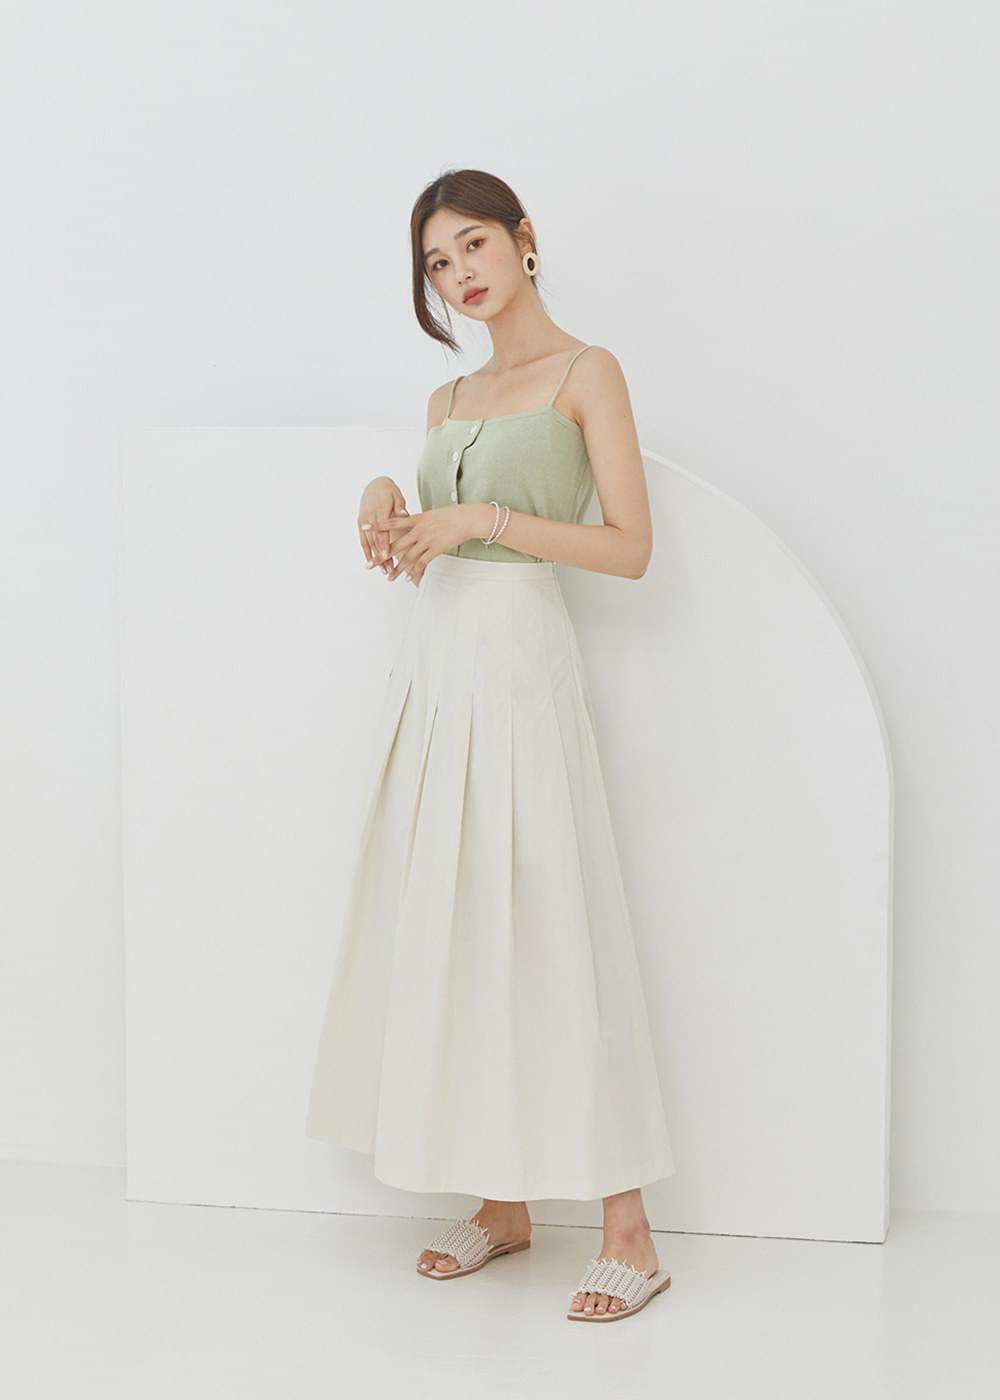 韓國空運 - Big pleated skirt 裙子